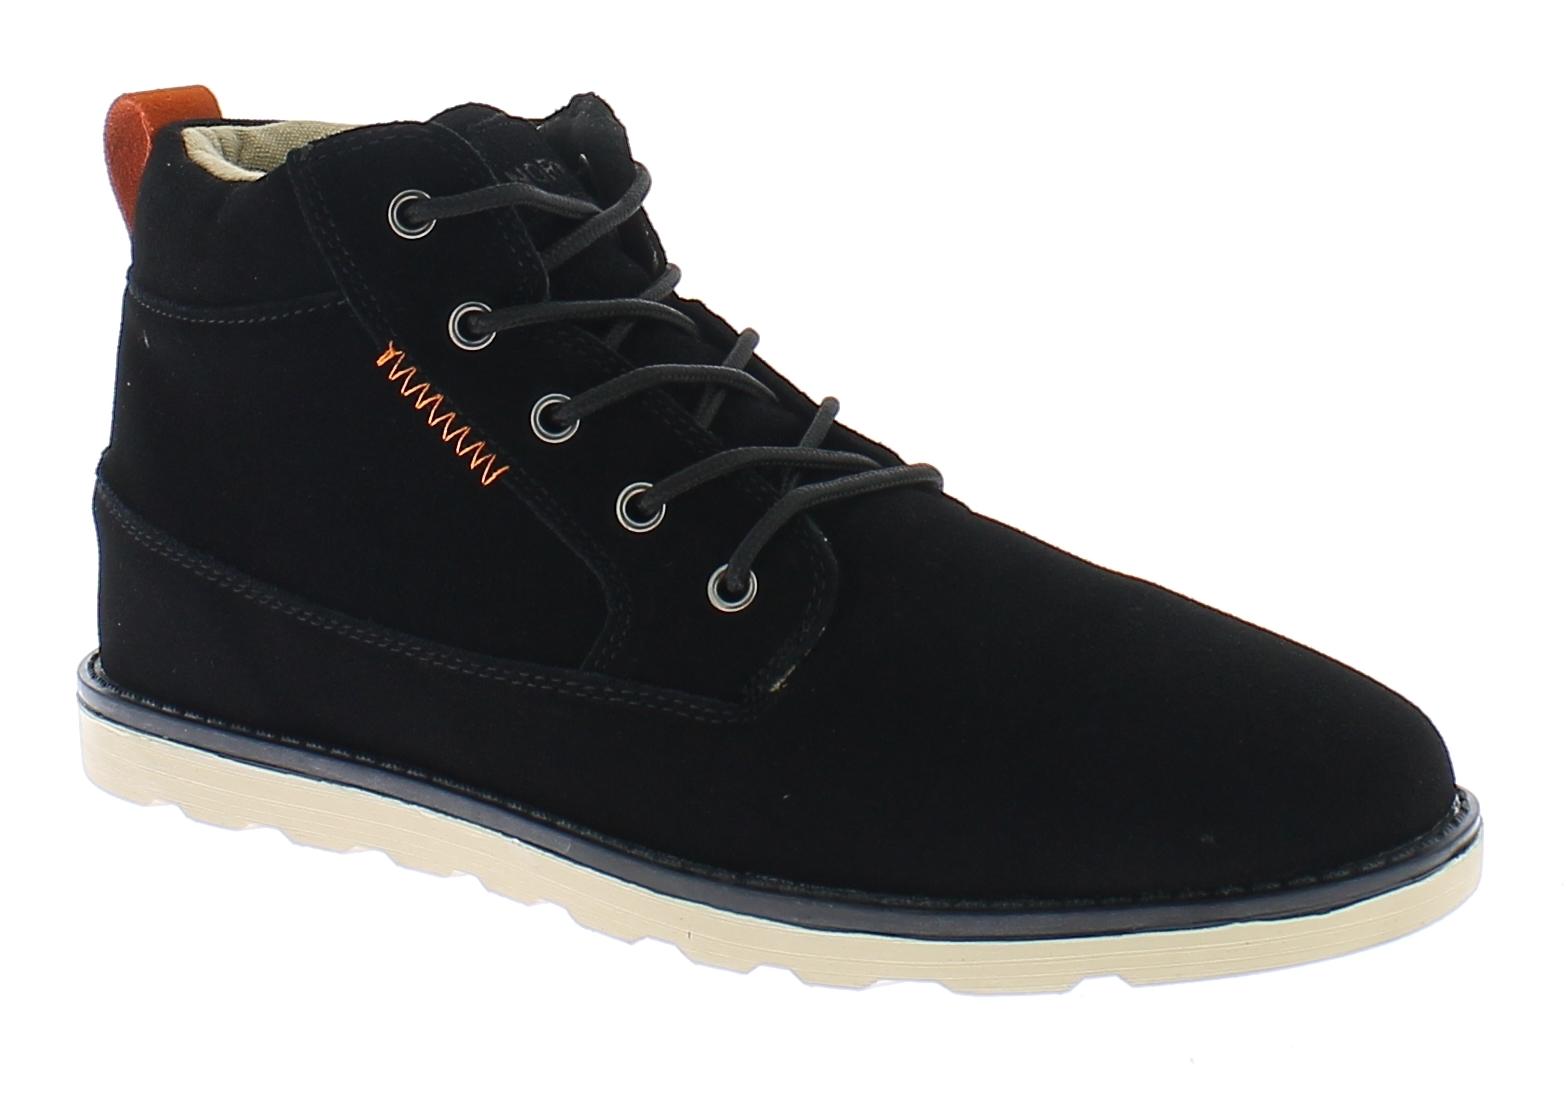 NORWAY Ανδρικό Μποτάκι B237364 Μαύρο - Μαύρο - B237364 BLACK-black-44/4/1/92